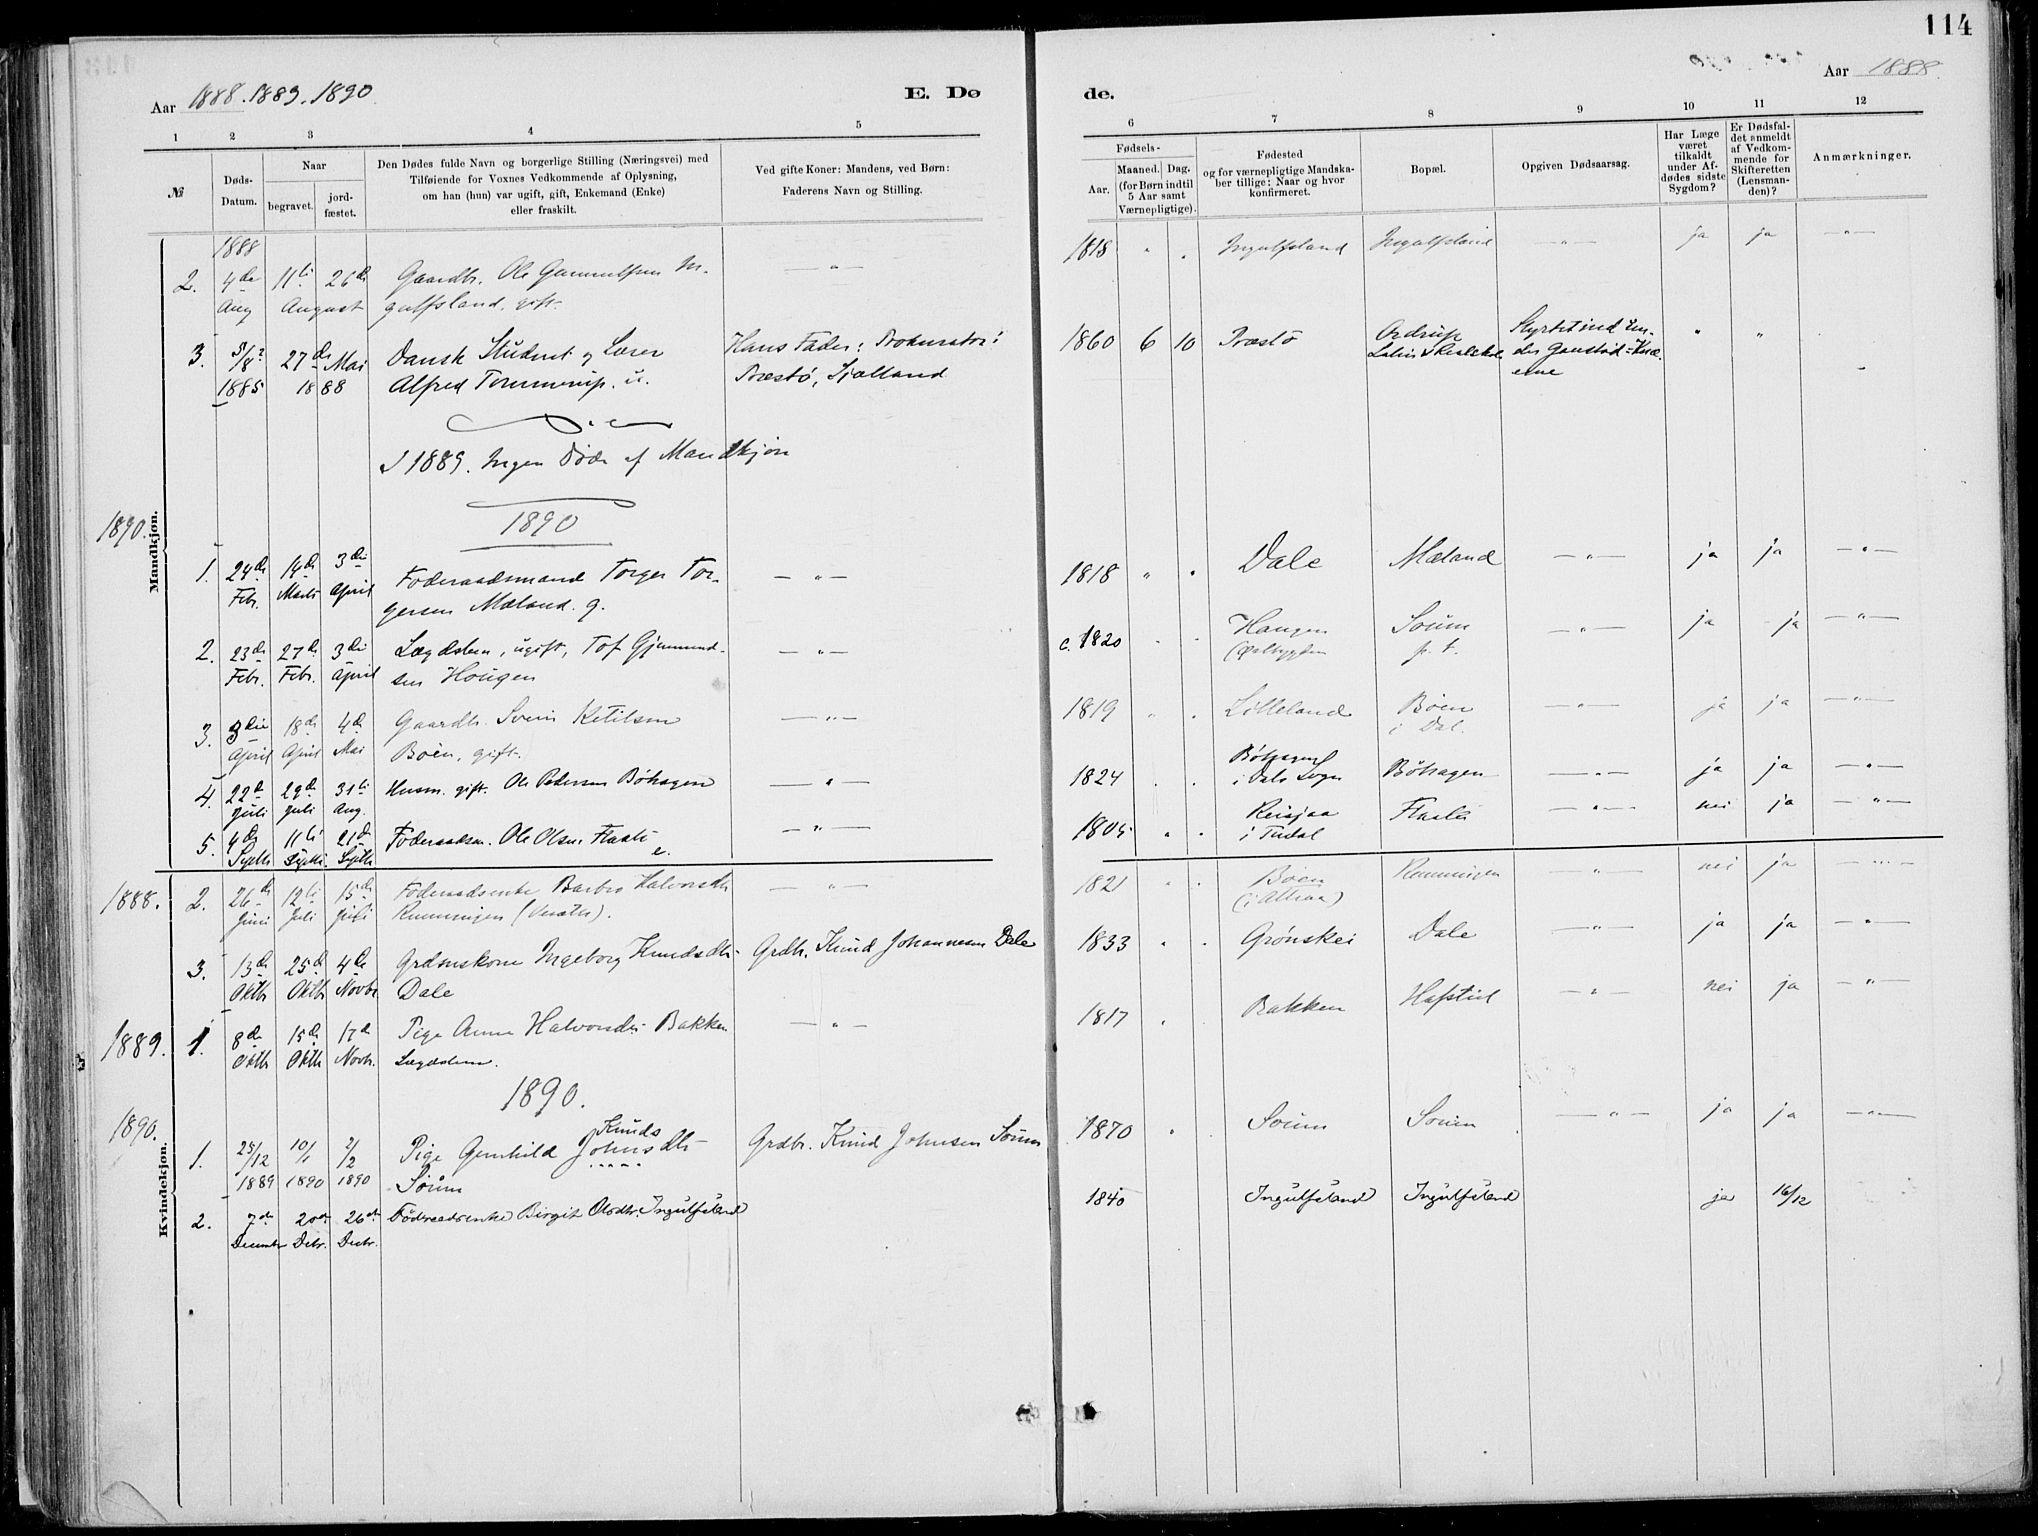 SAKO, Rjukan kirkebøker, F/Fa/L0001: Ministerialbok nr. 1, 1878-1912, s. 114